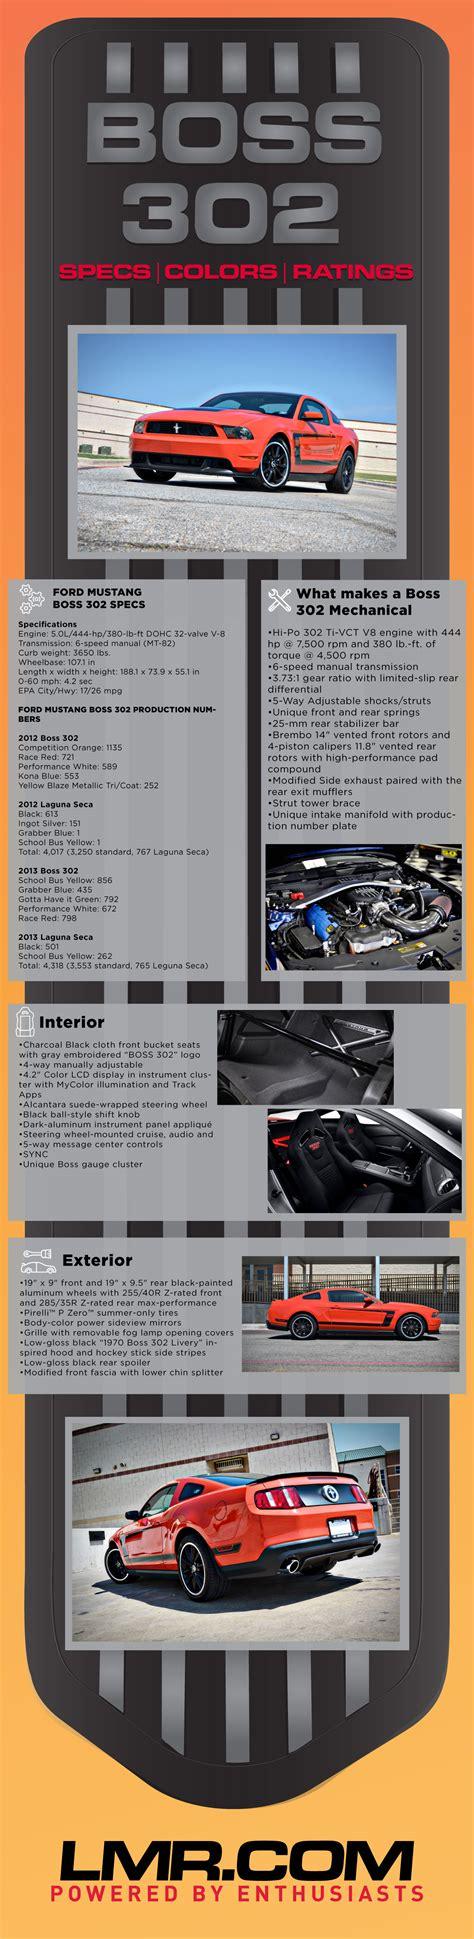 2012 Ford Mustang 302 Specs 2012 2013 302 specs lmr